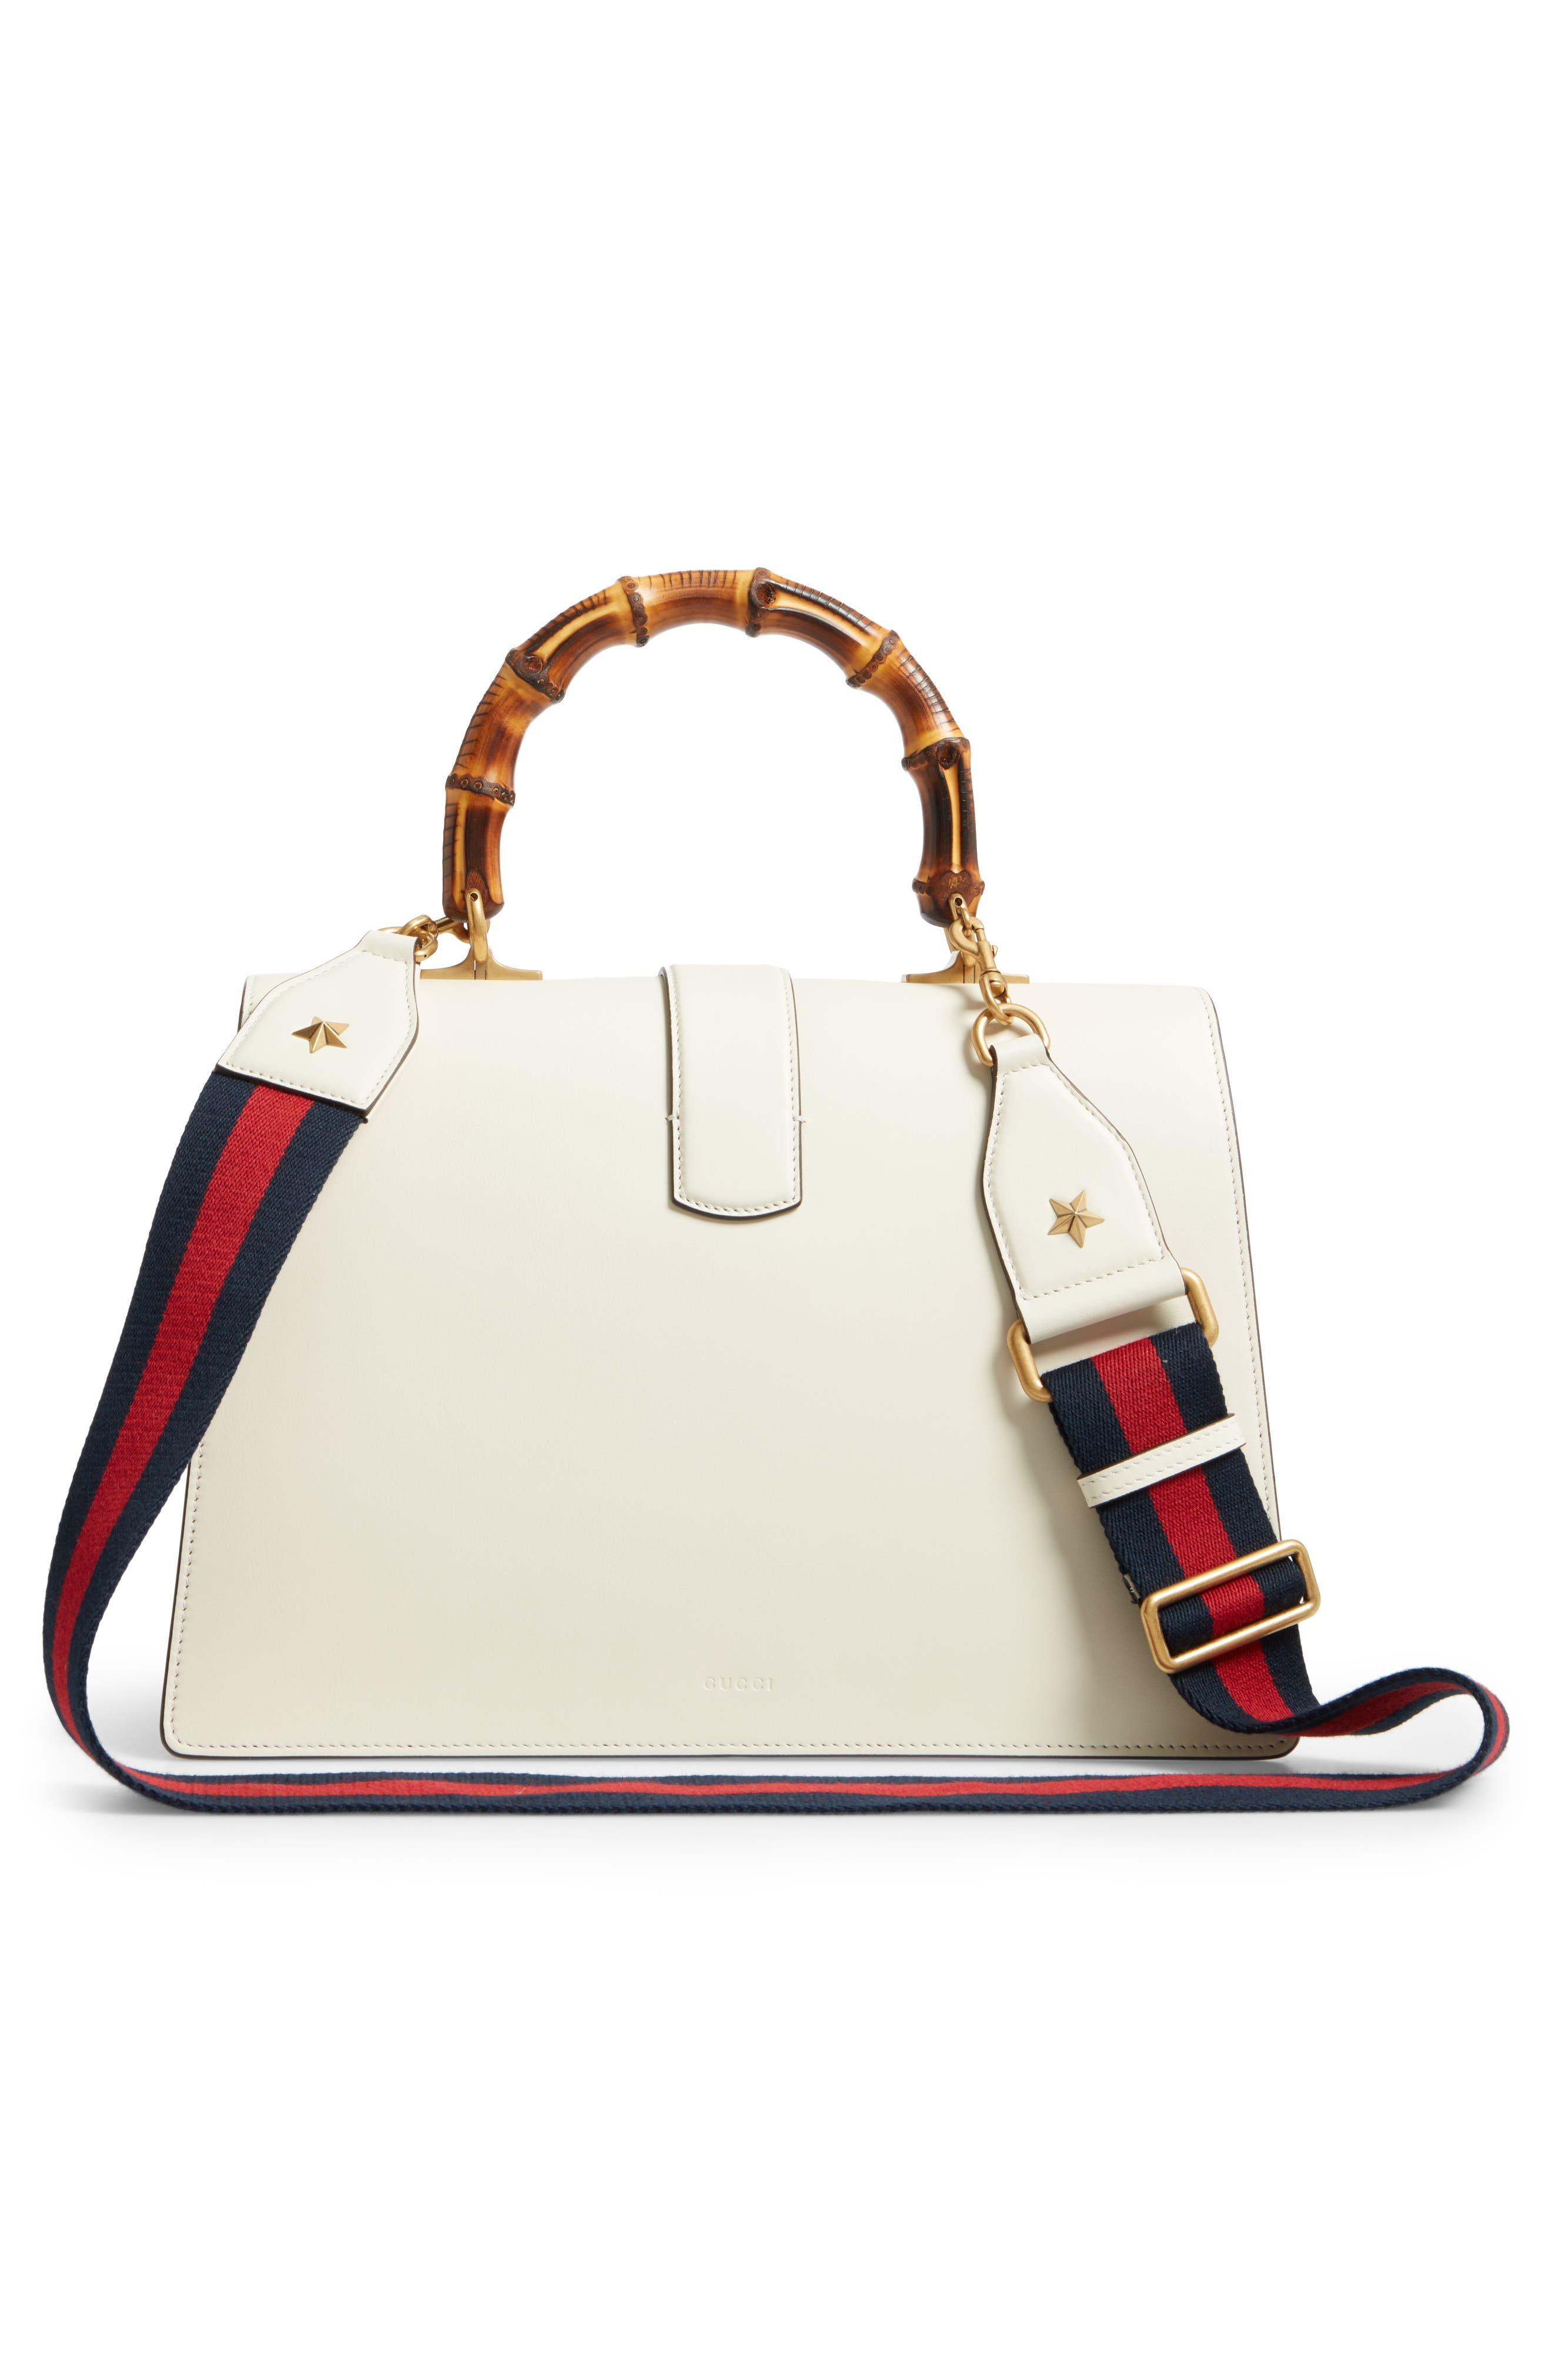 Large Dionysus Top Handle Leather Shoulder Bag,                             Alternate thumbnail 3, color,                             Mystic White/ Blue/ Red